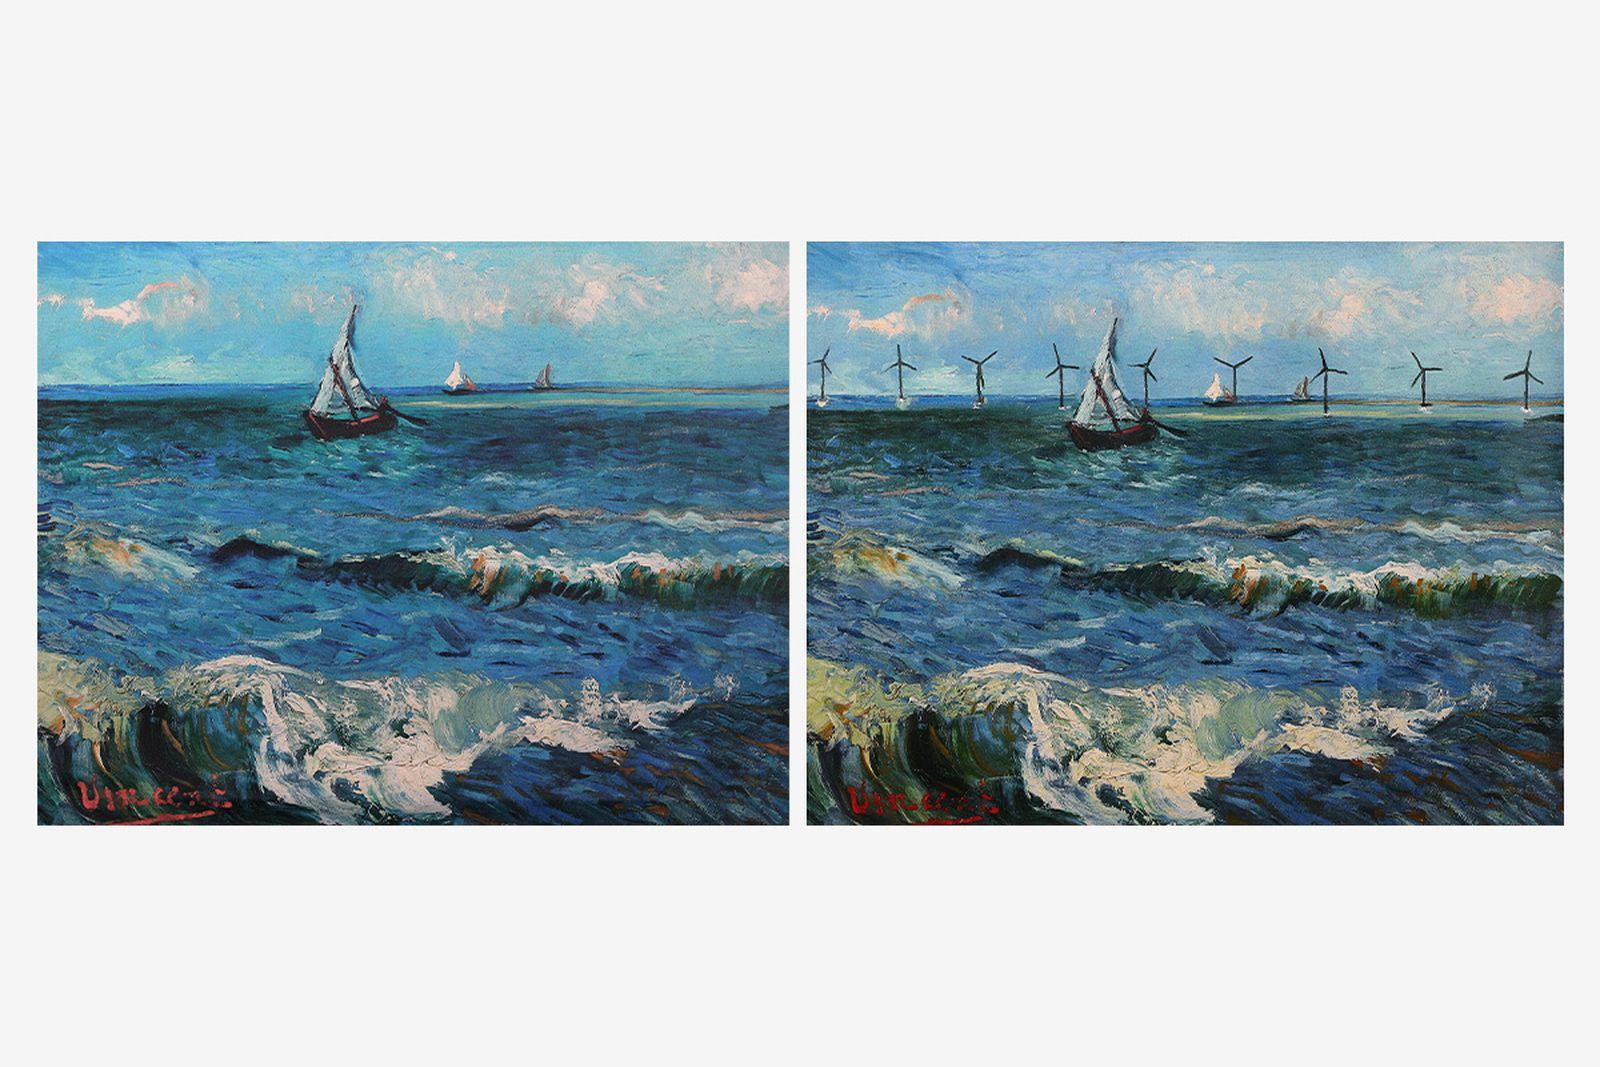 reuben-dangoor-taps-the-great-masters-to-imagine-future-seascapes-07